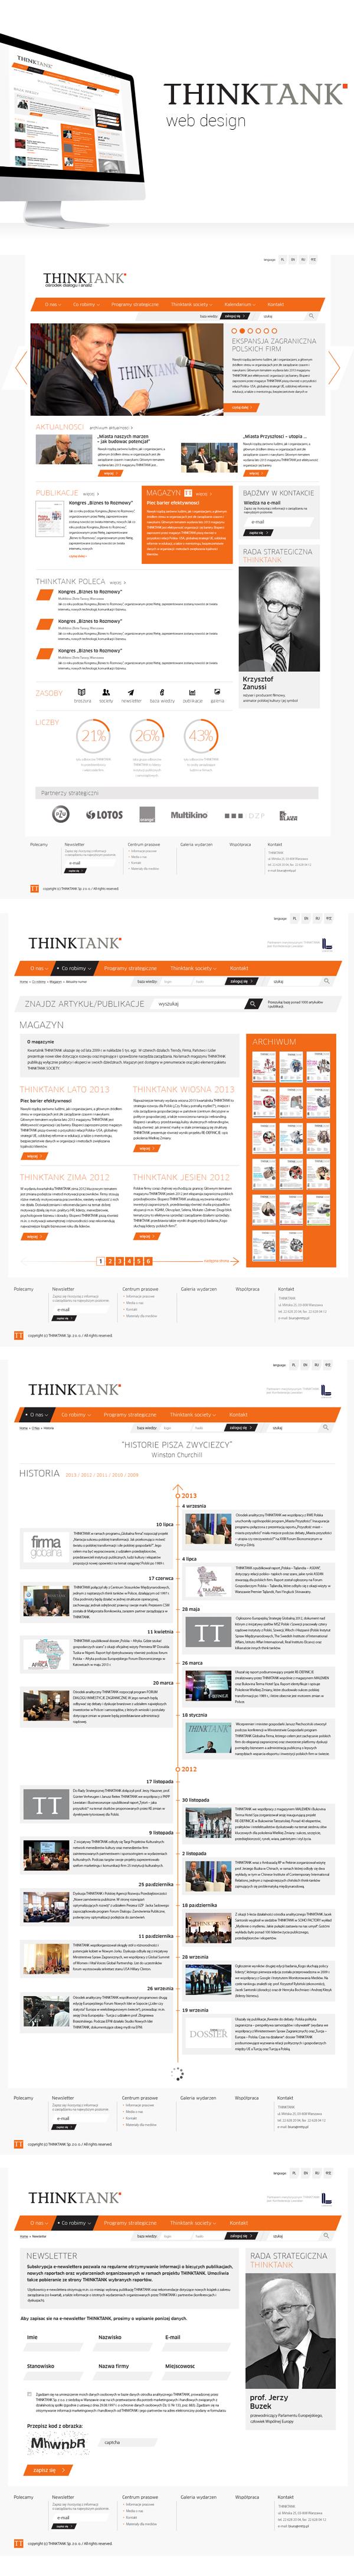 thinktank business magazine